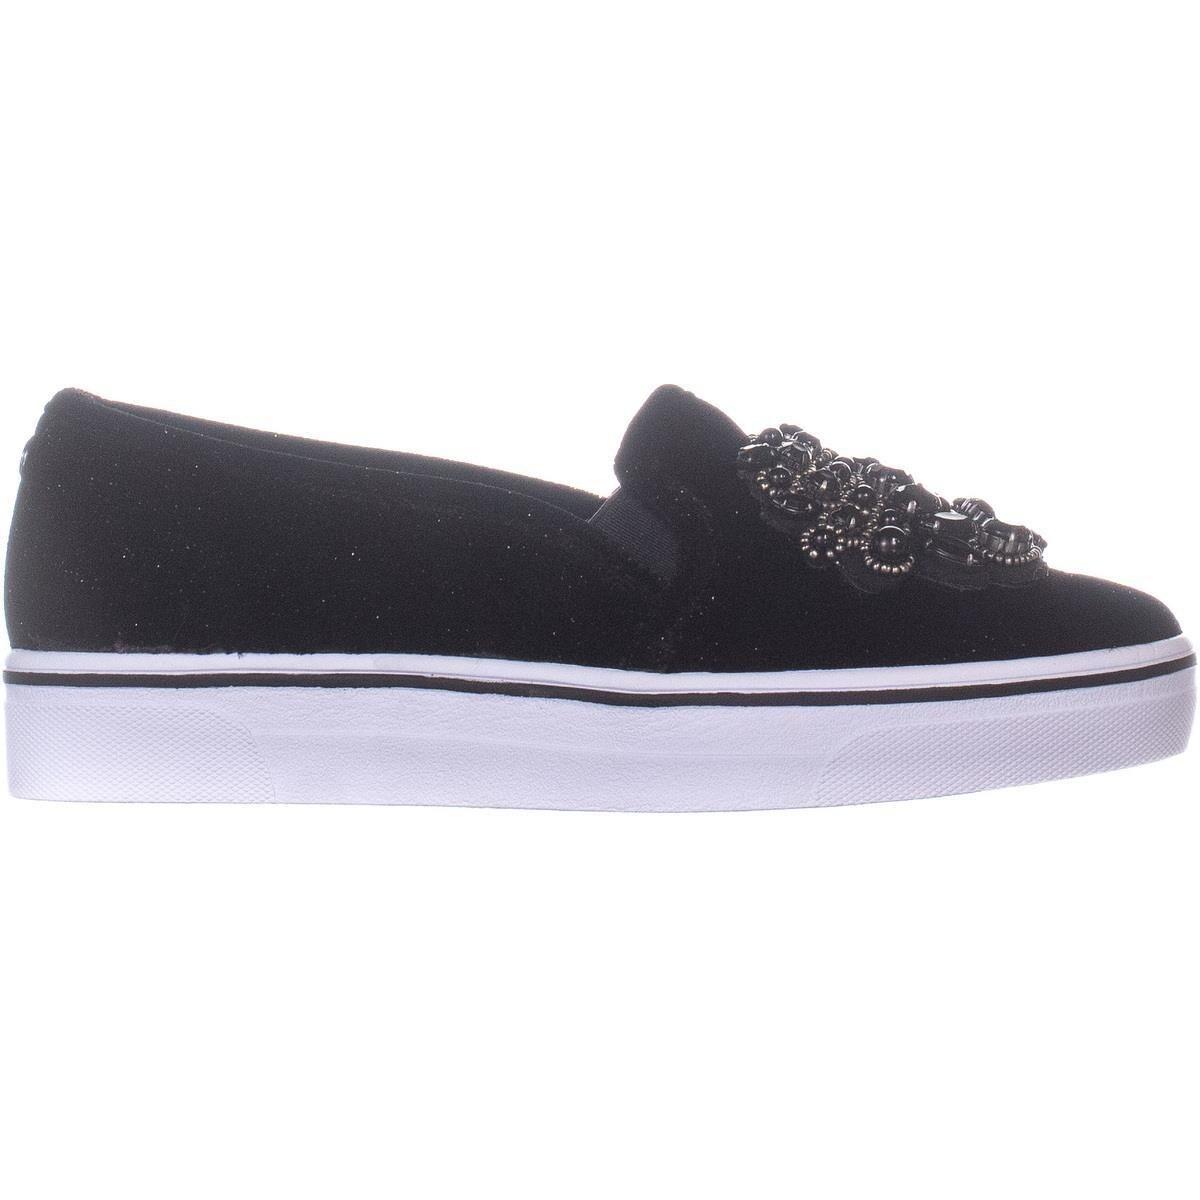 Shop Anne Klein Zymone Slip-on Sneakers